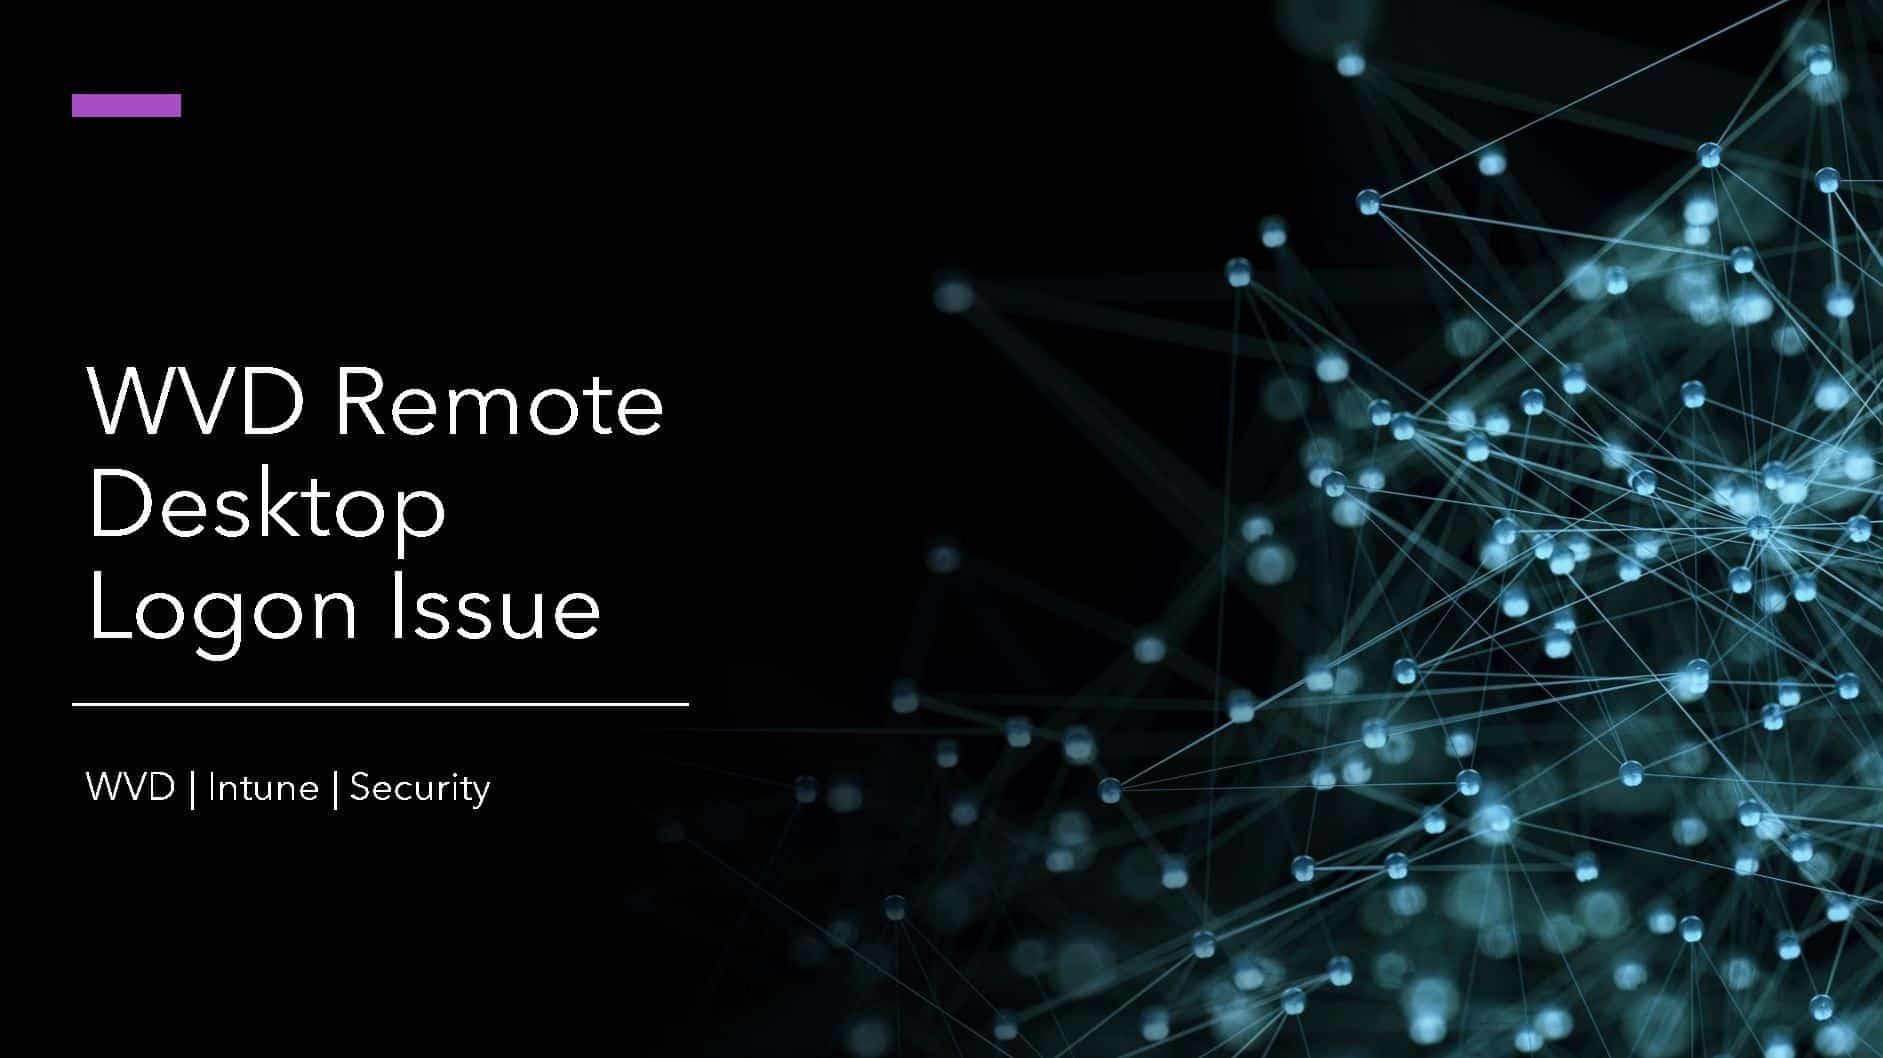 WVD Remote Desktop Logon Issue